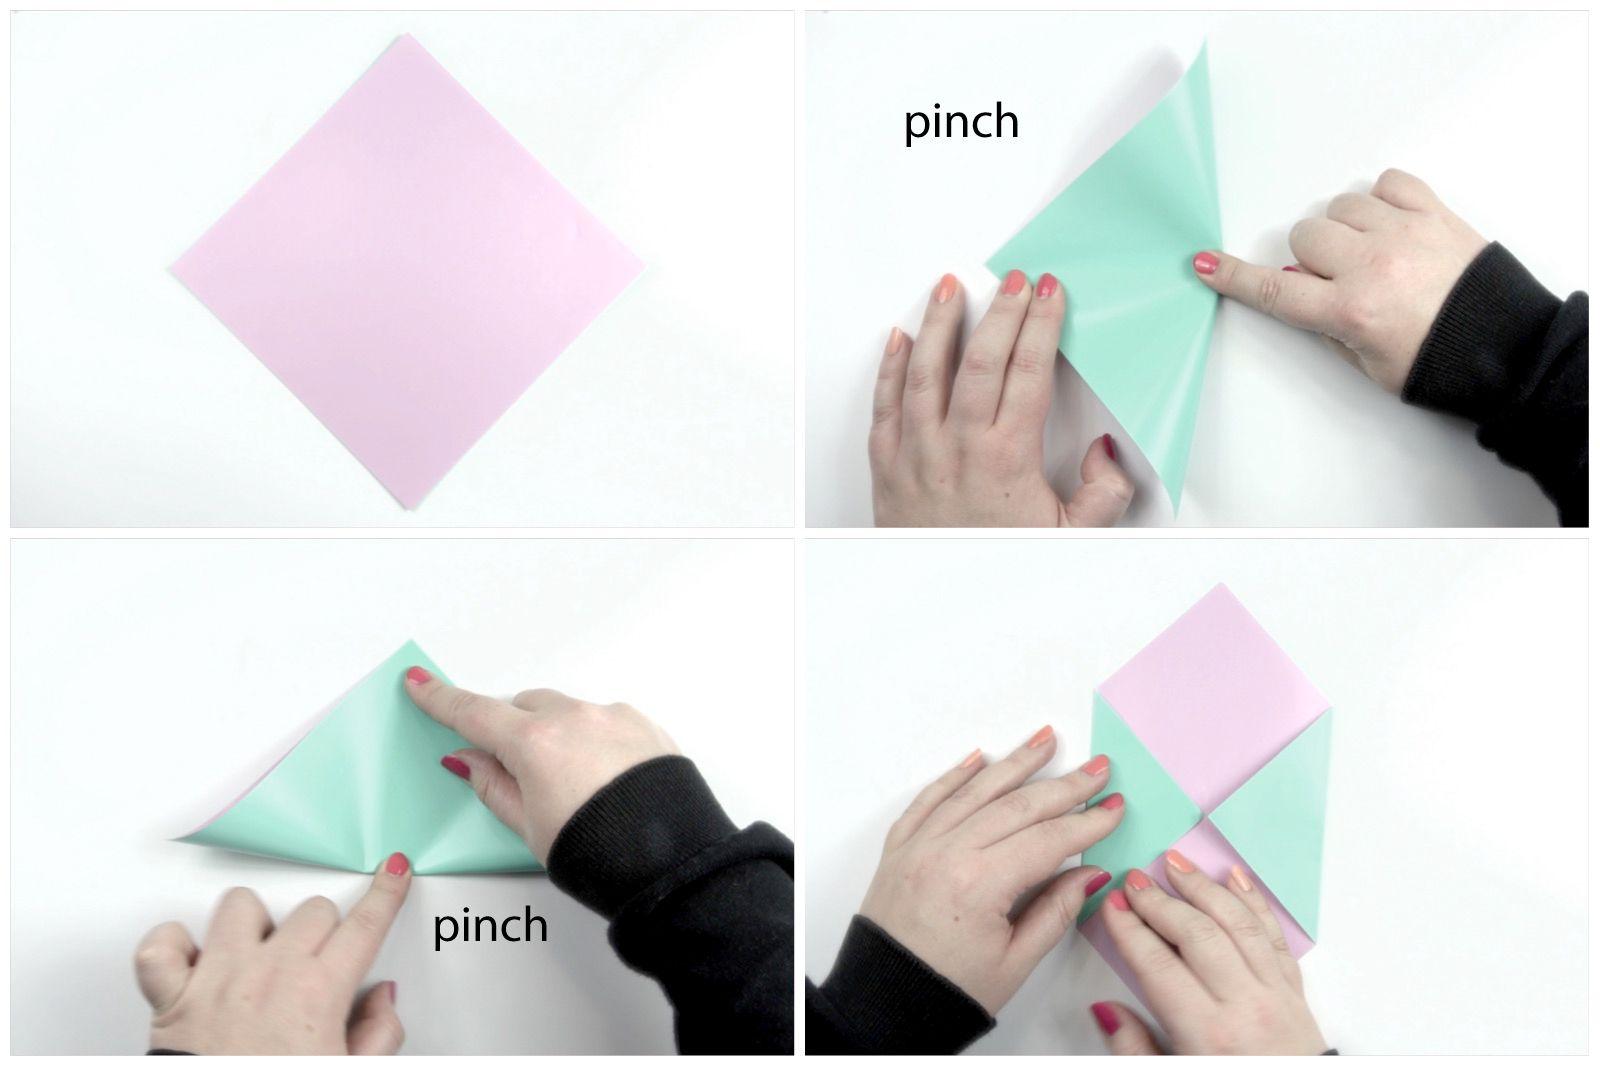 Beginning folds of an origami envelope